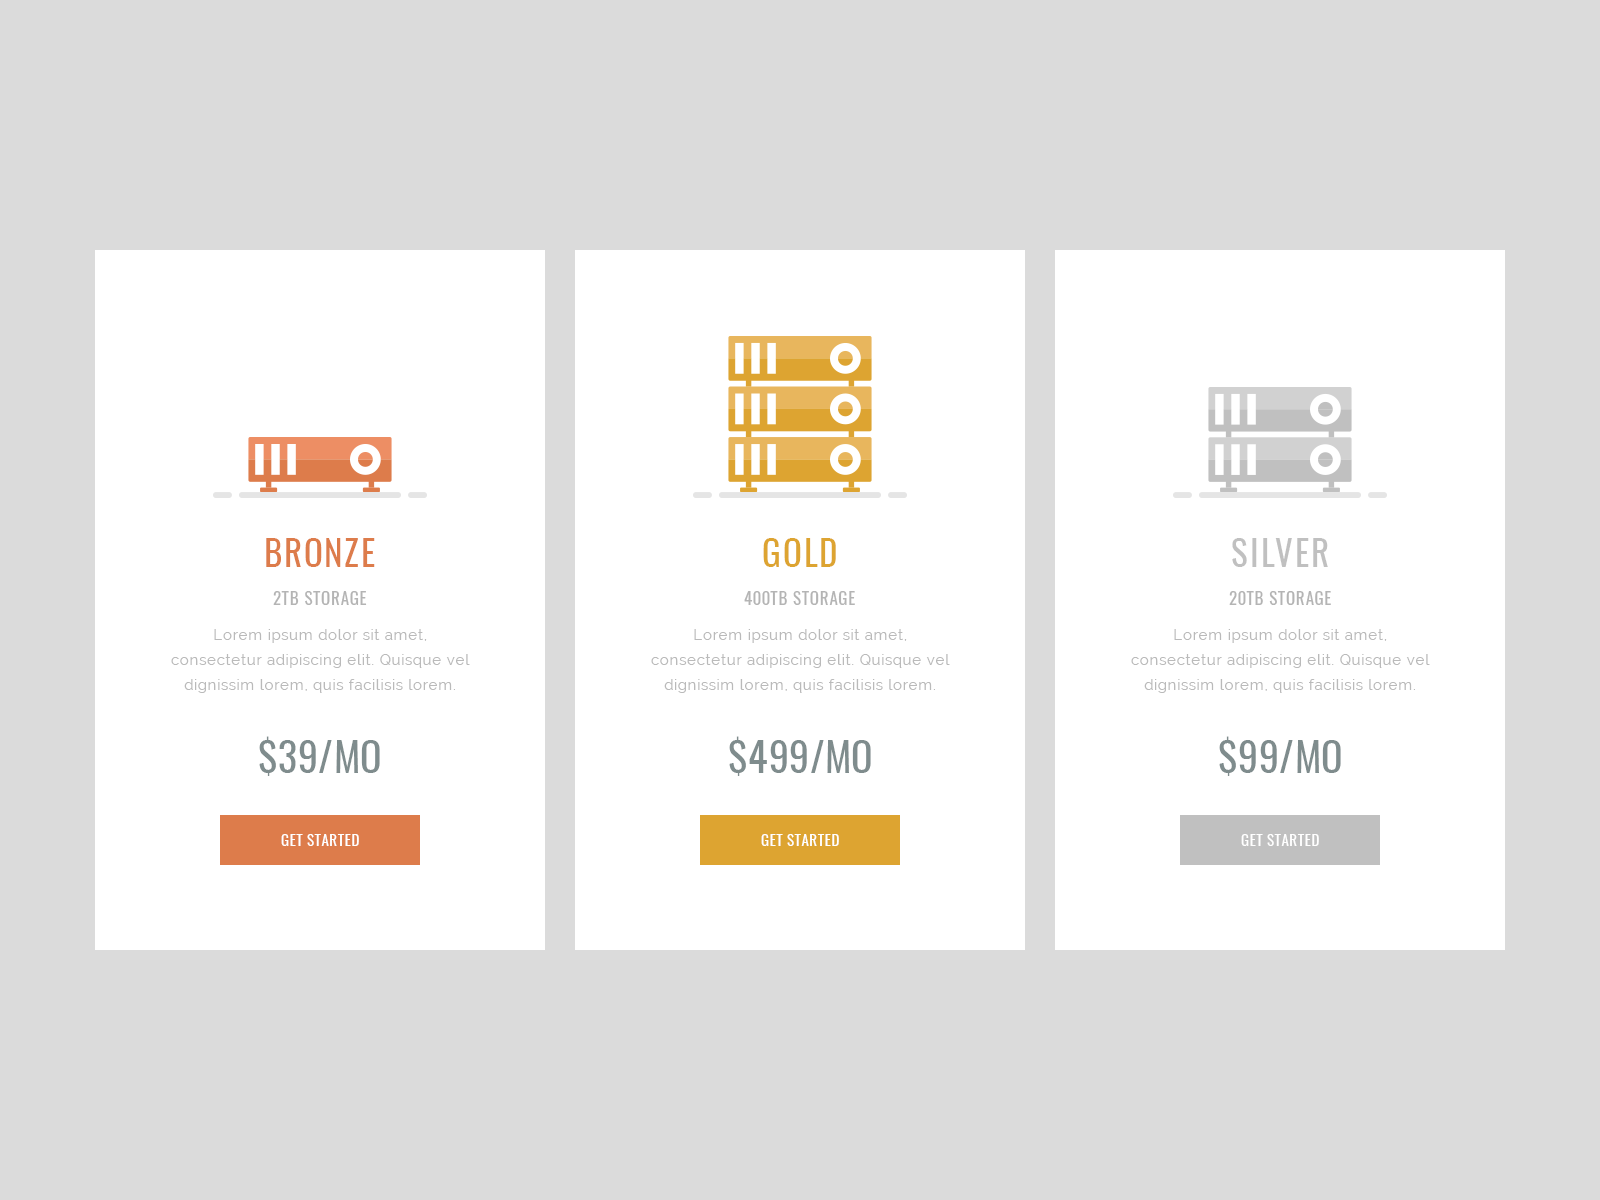 Simple Pricing Table UI Design Free PSD